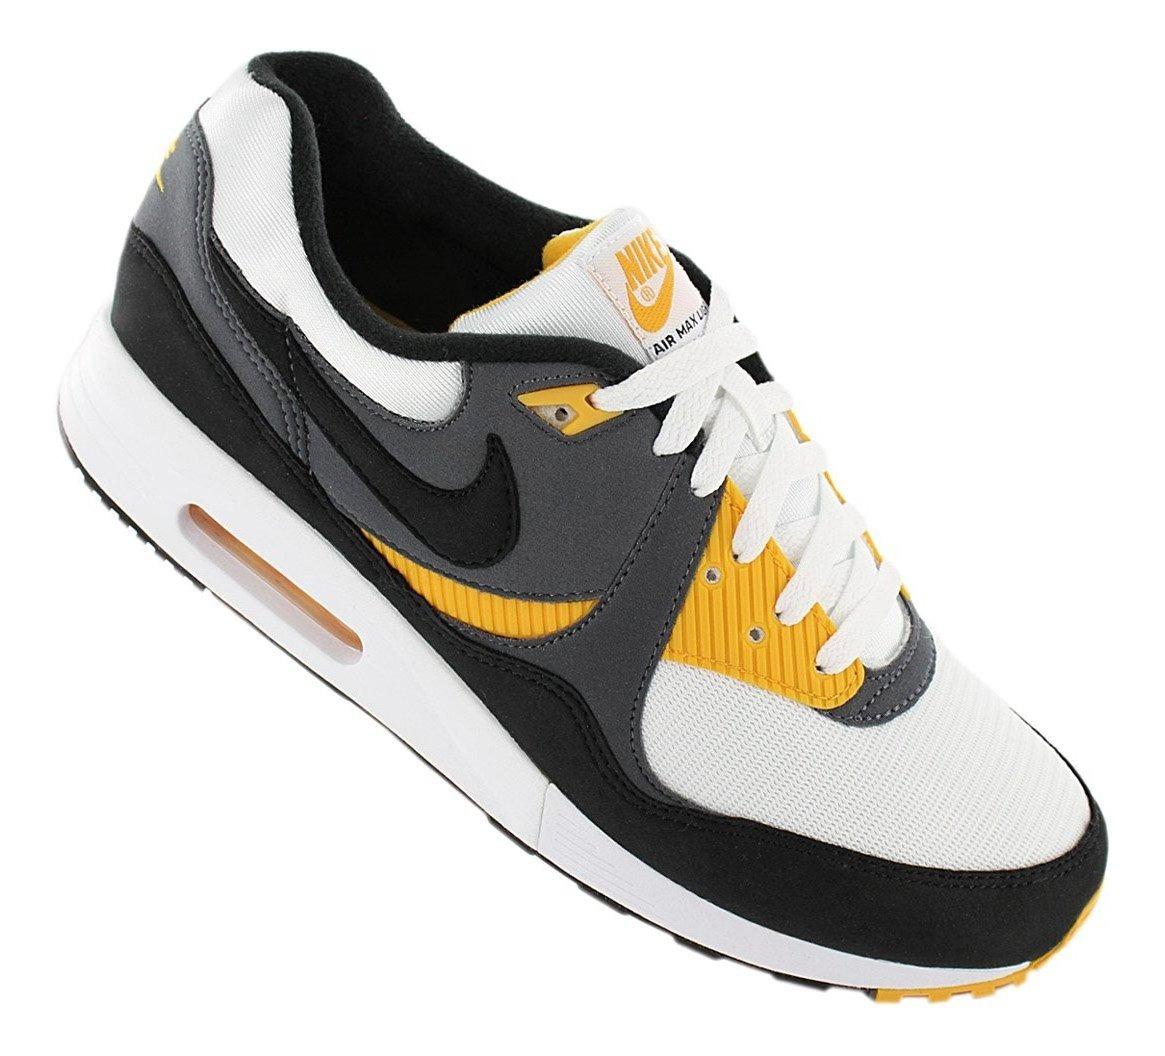 Tenis Nike Light Air Max GrisBlancoNegroAmarillo27cm RAqjLc354S